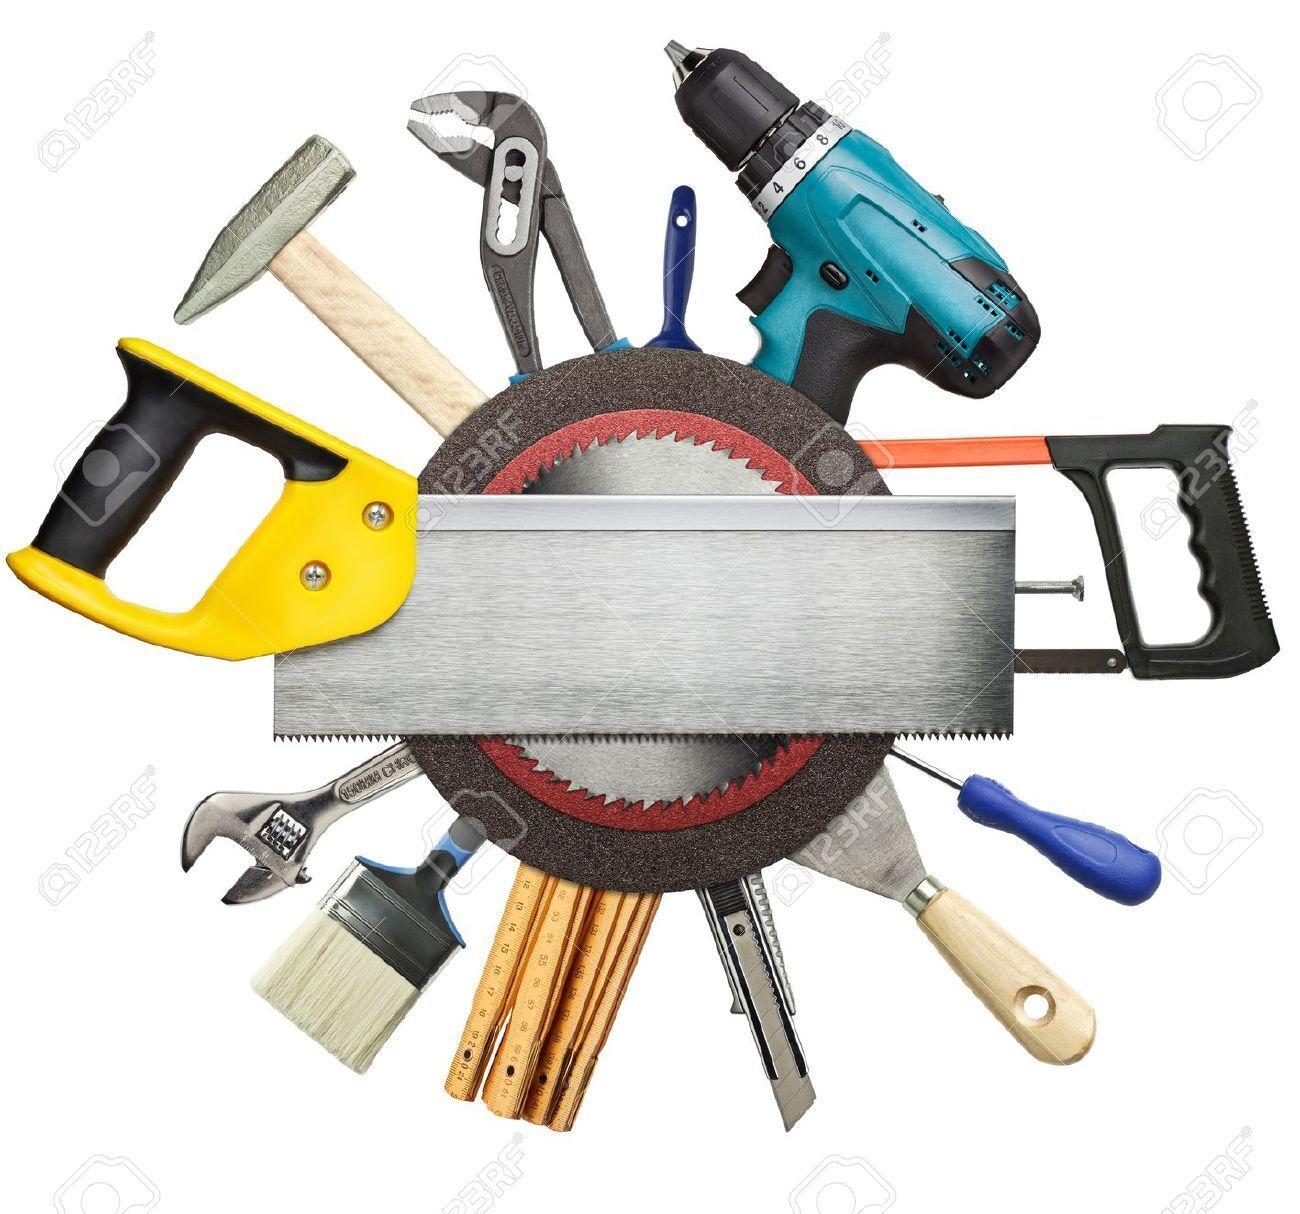 A Tradies Tools